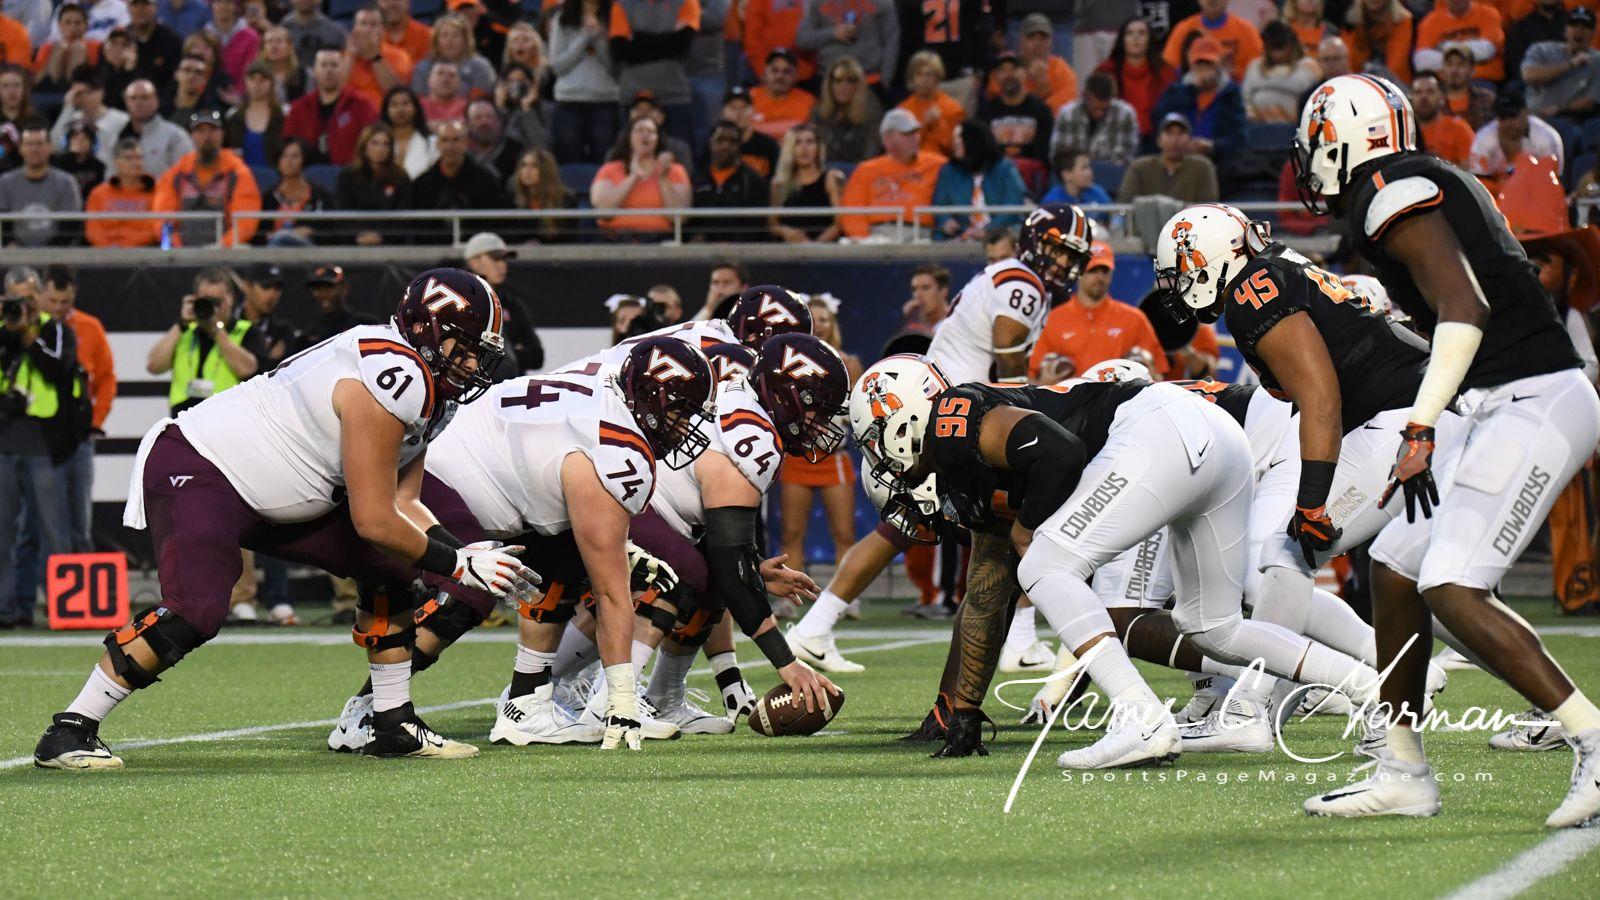 Gallery NCAA Football Camping World Bowl: #19 Oklahoma State